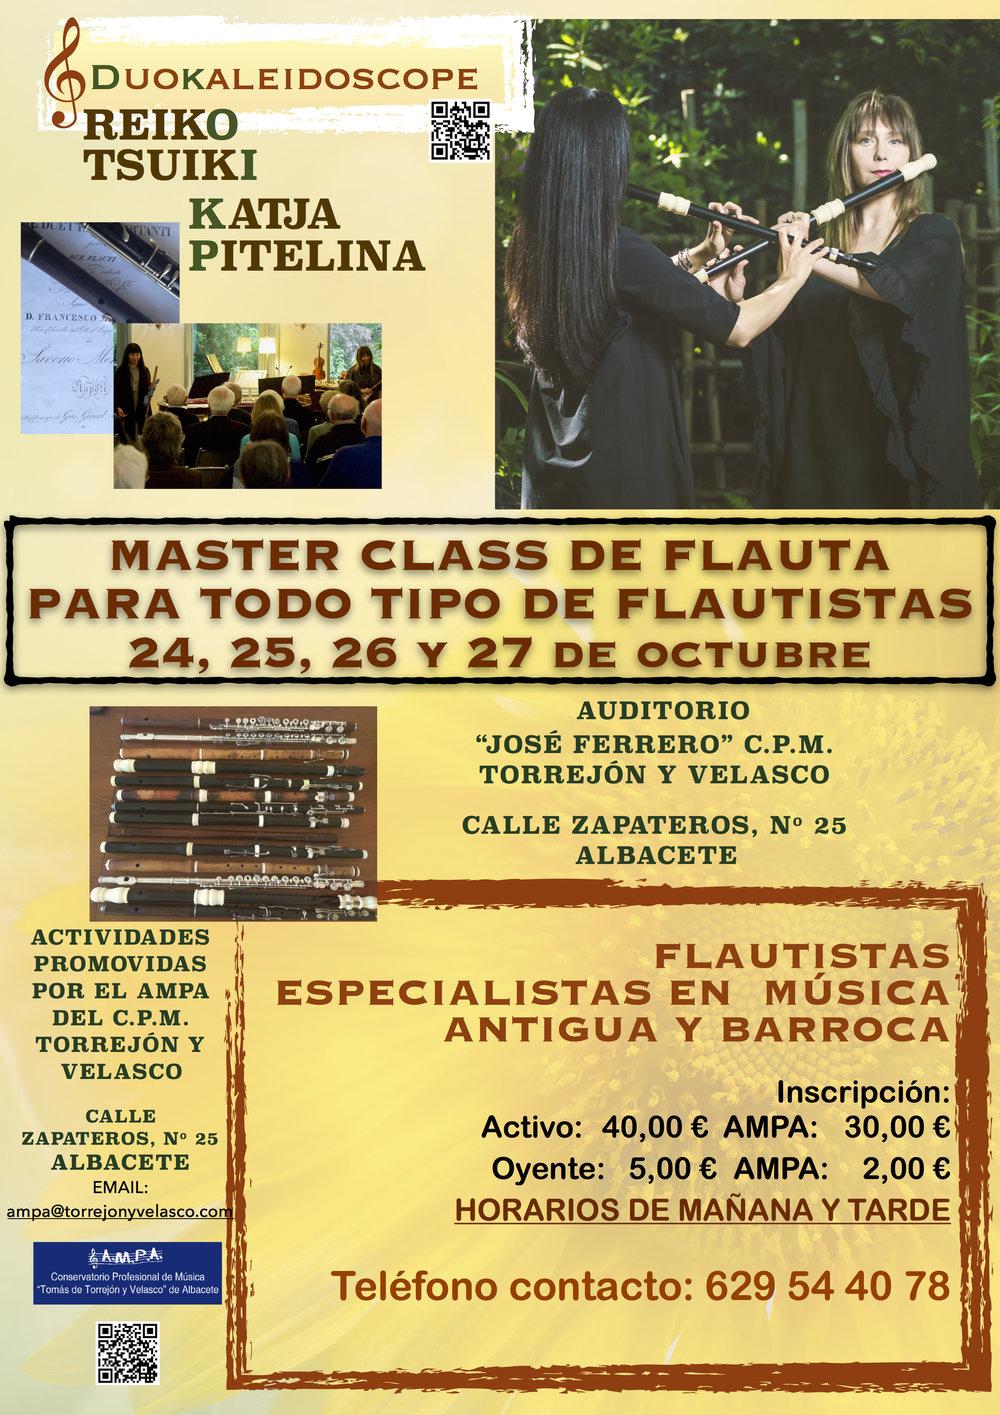 ALbacete poster 2 .jpg